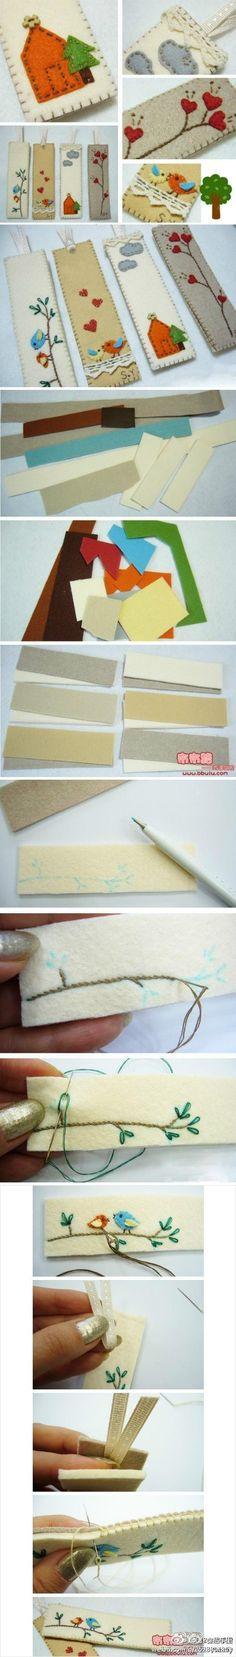 Book marking diy hand made cute